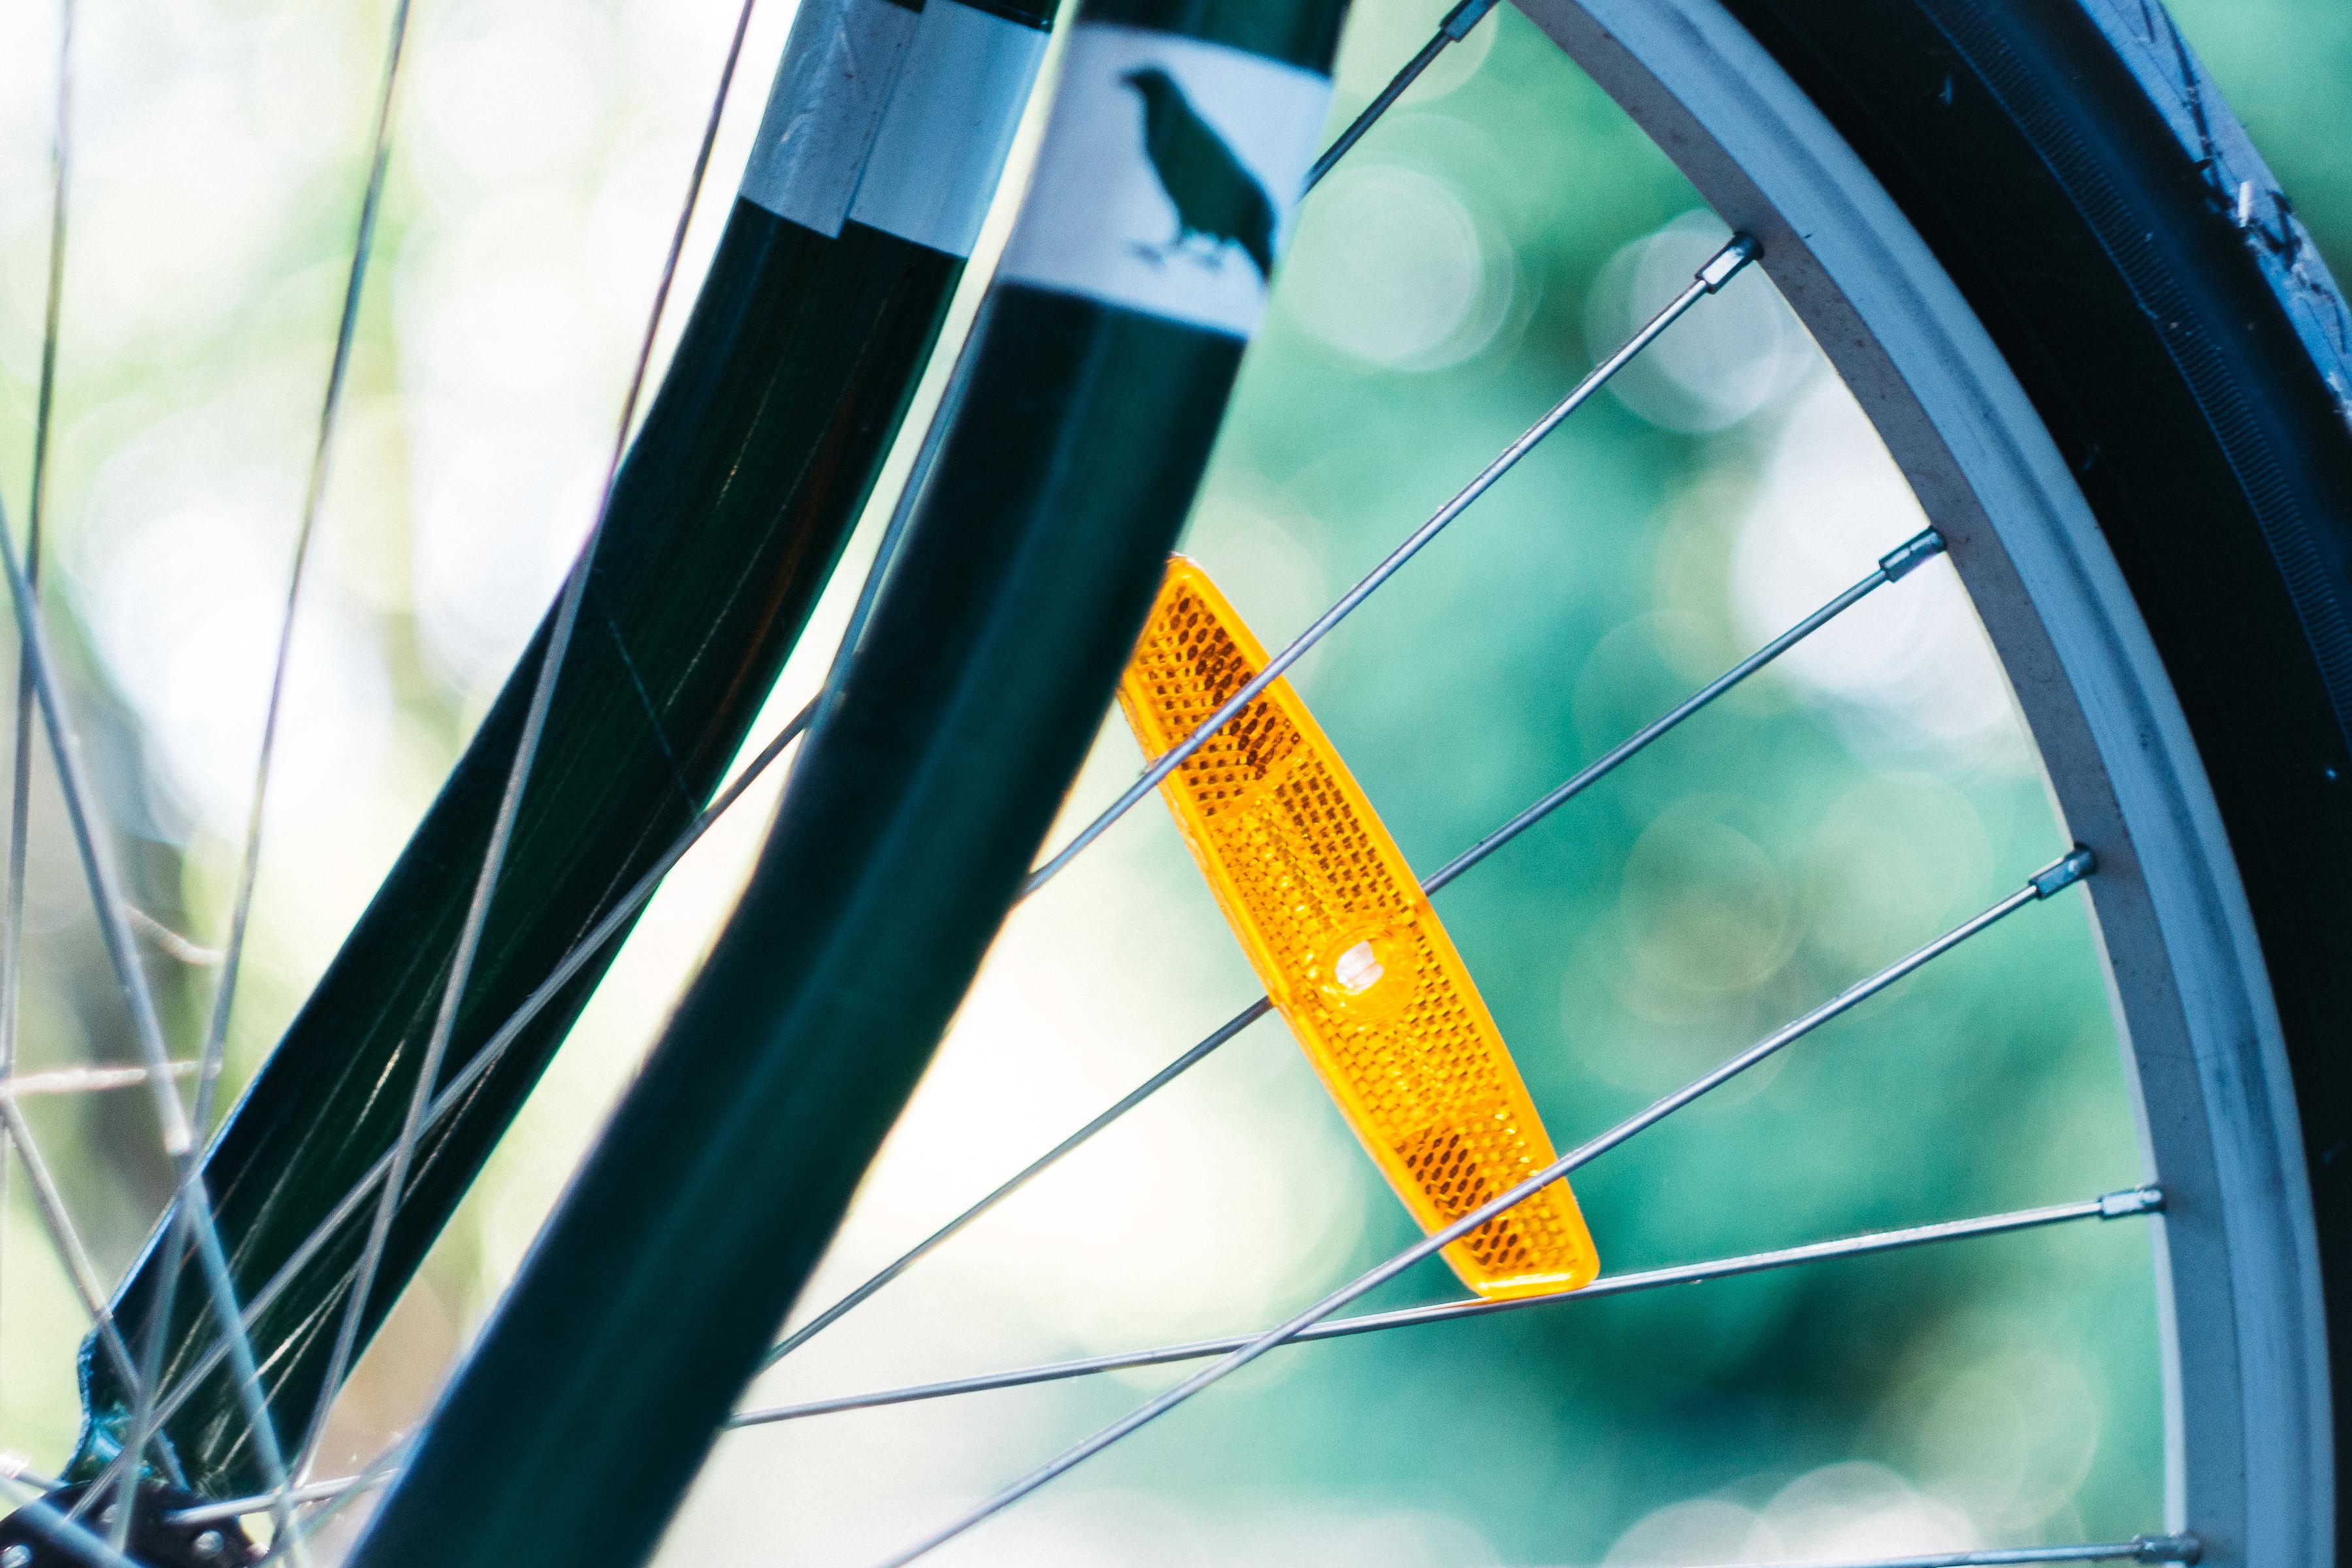 Kostenlose foto : Bokeh, Rad, Fenster, Glas, Fahrrad, Linie, Grün ...